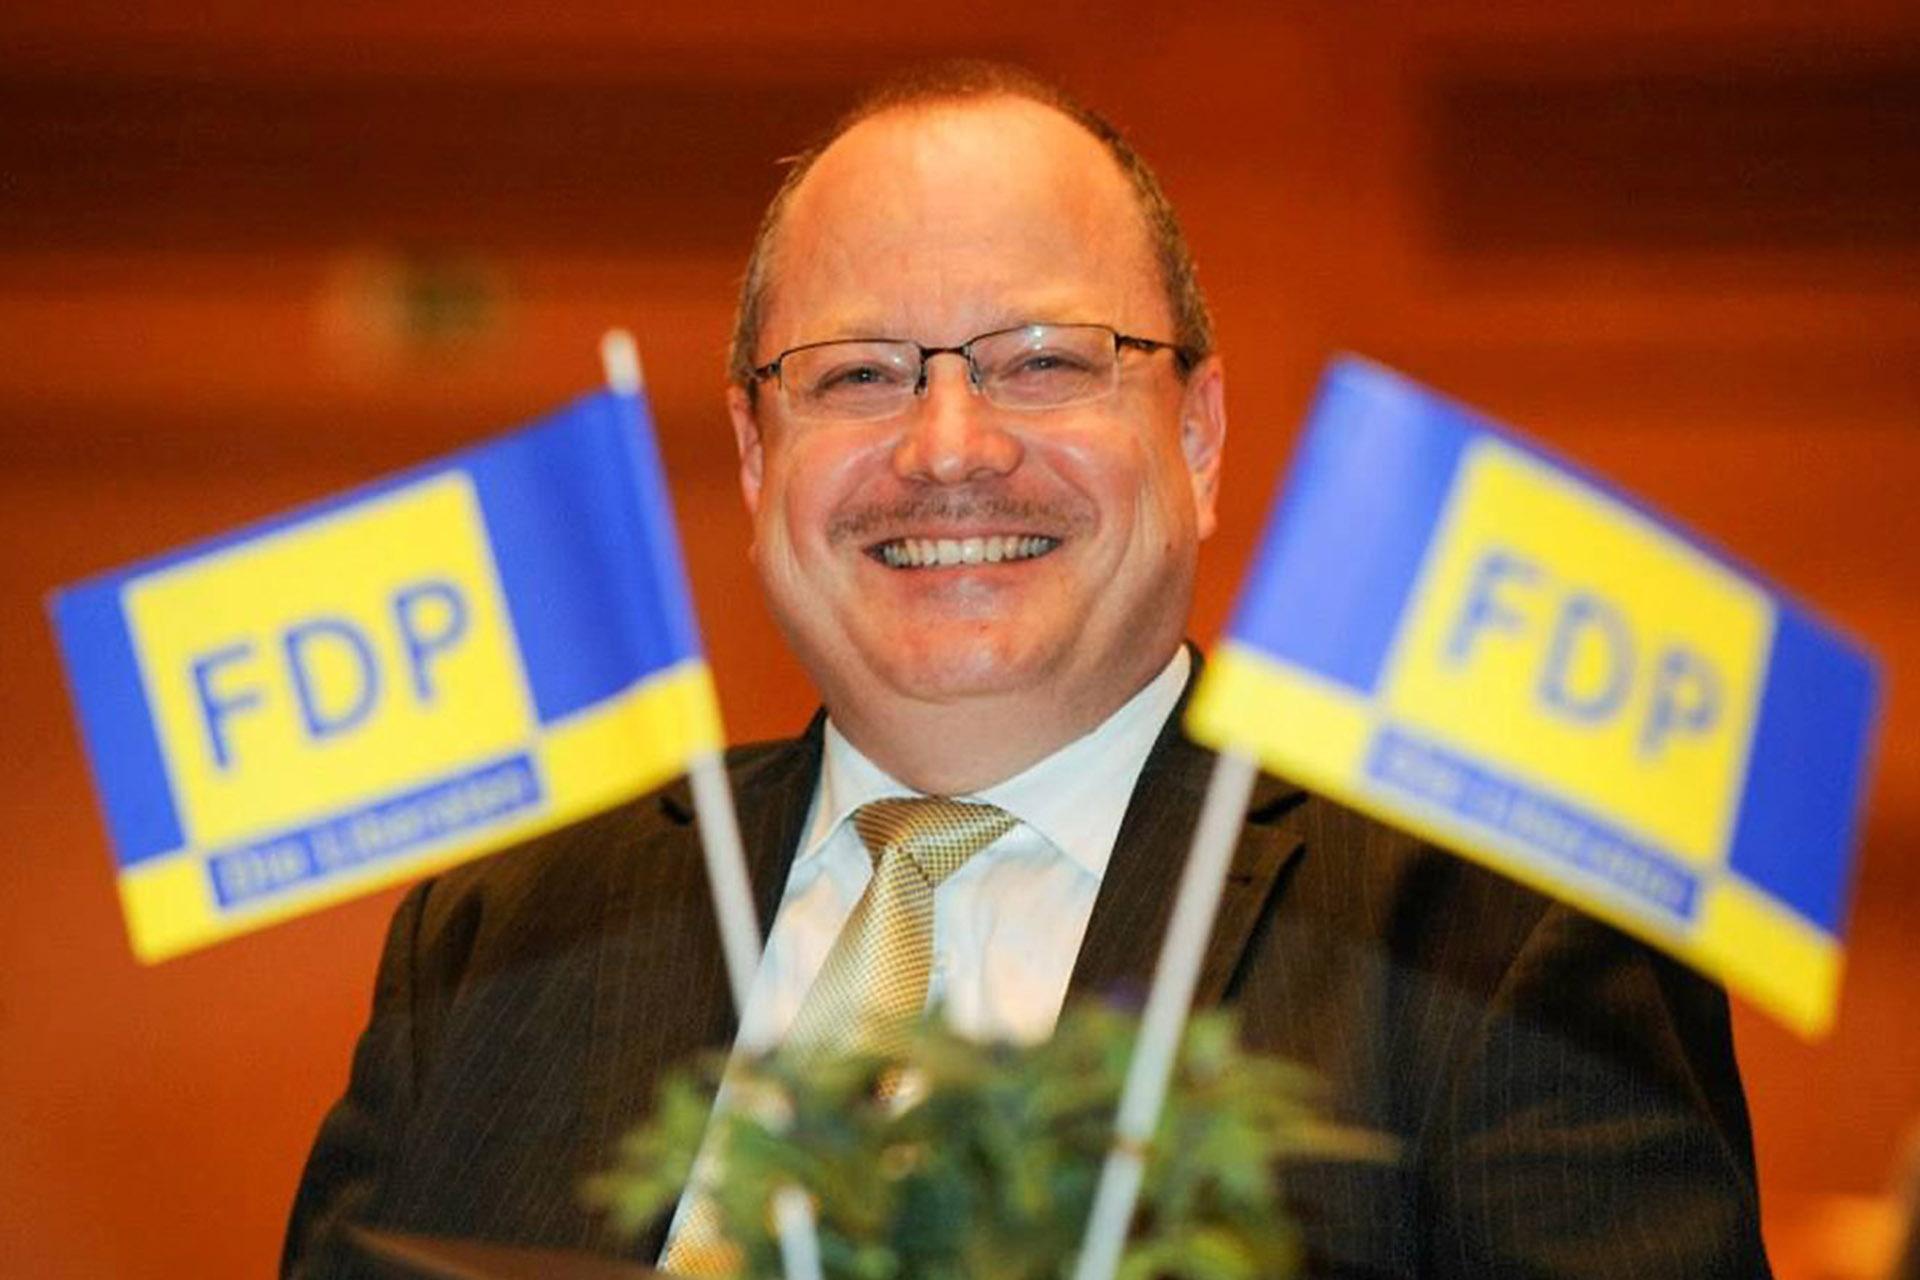 FDP-Landtagsabgeordnete Dirk Bergner